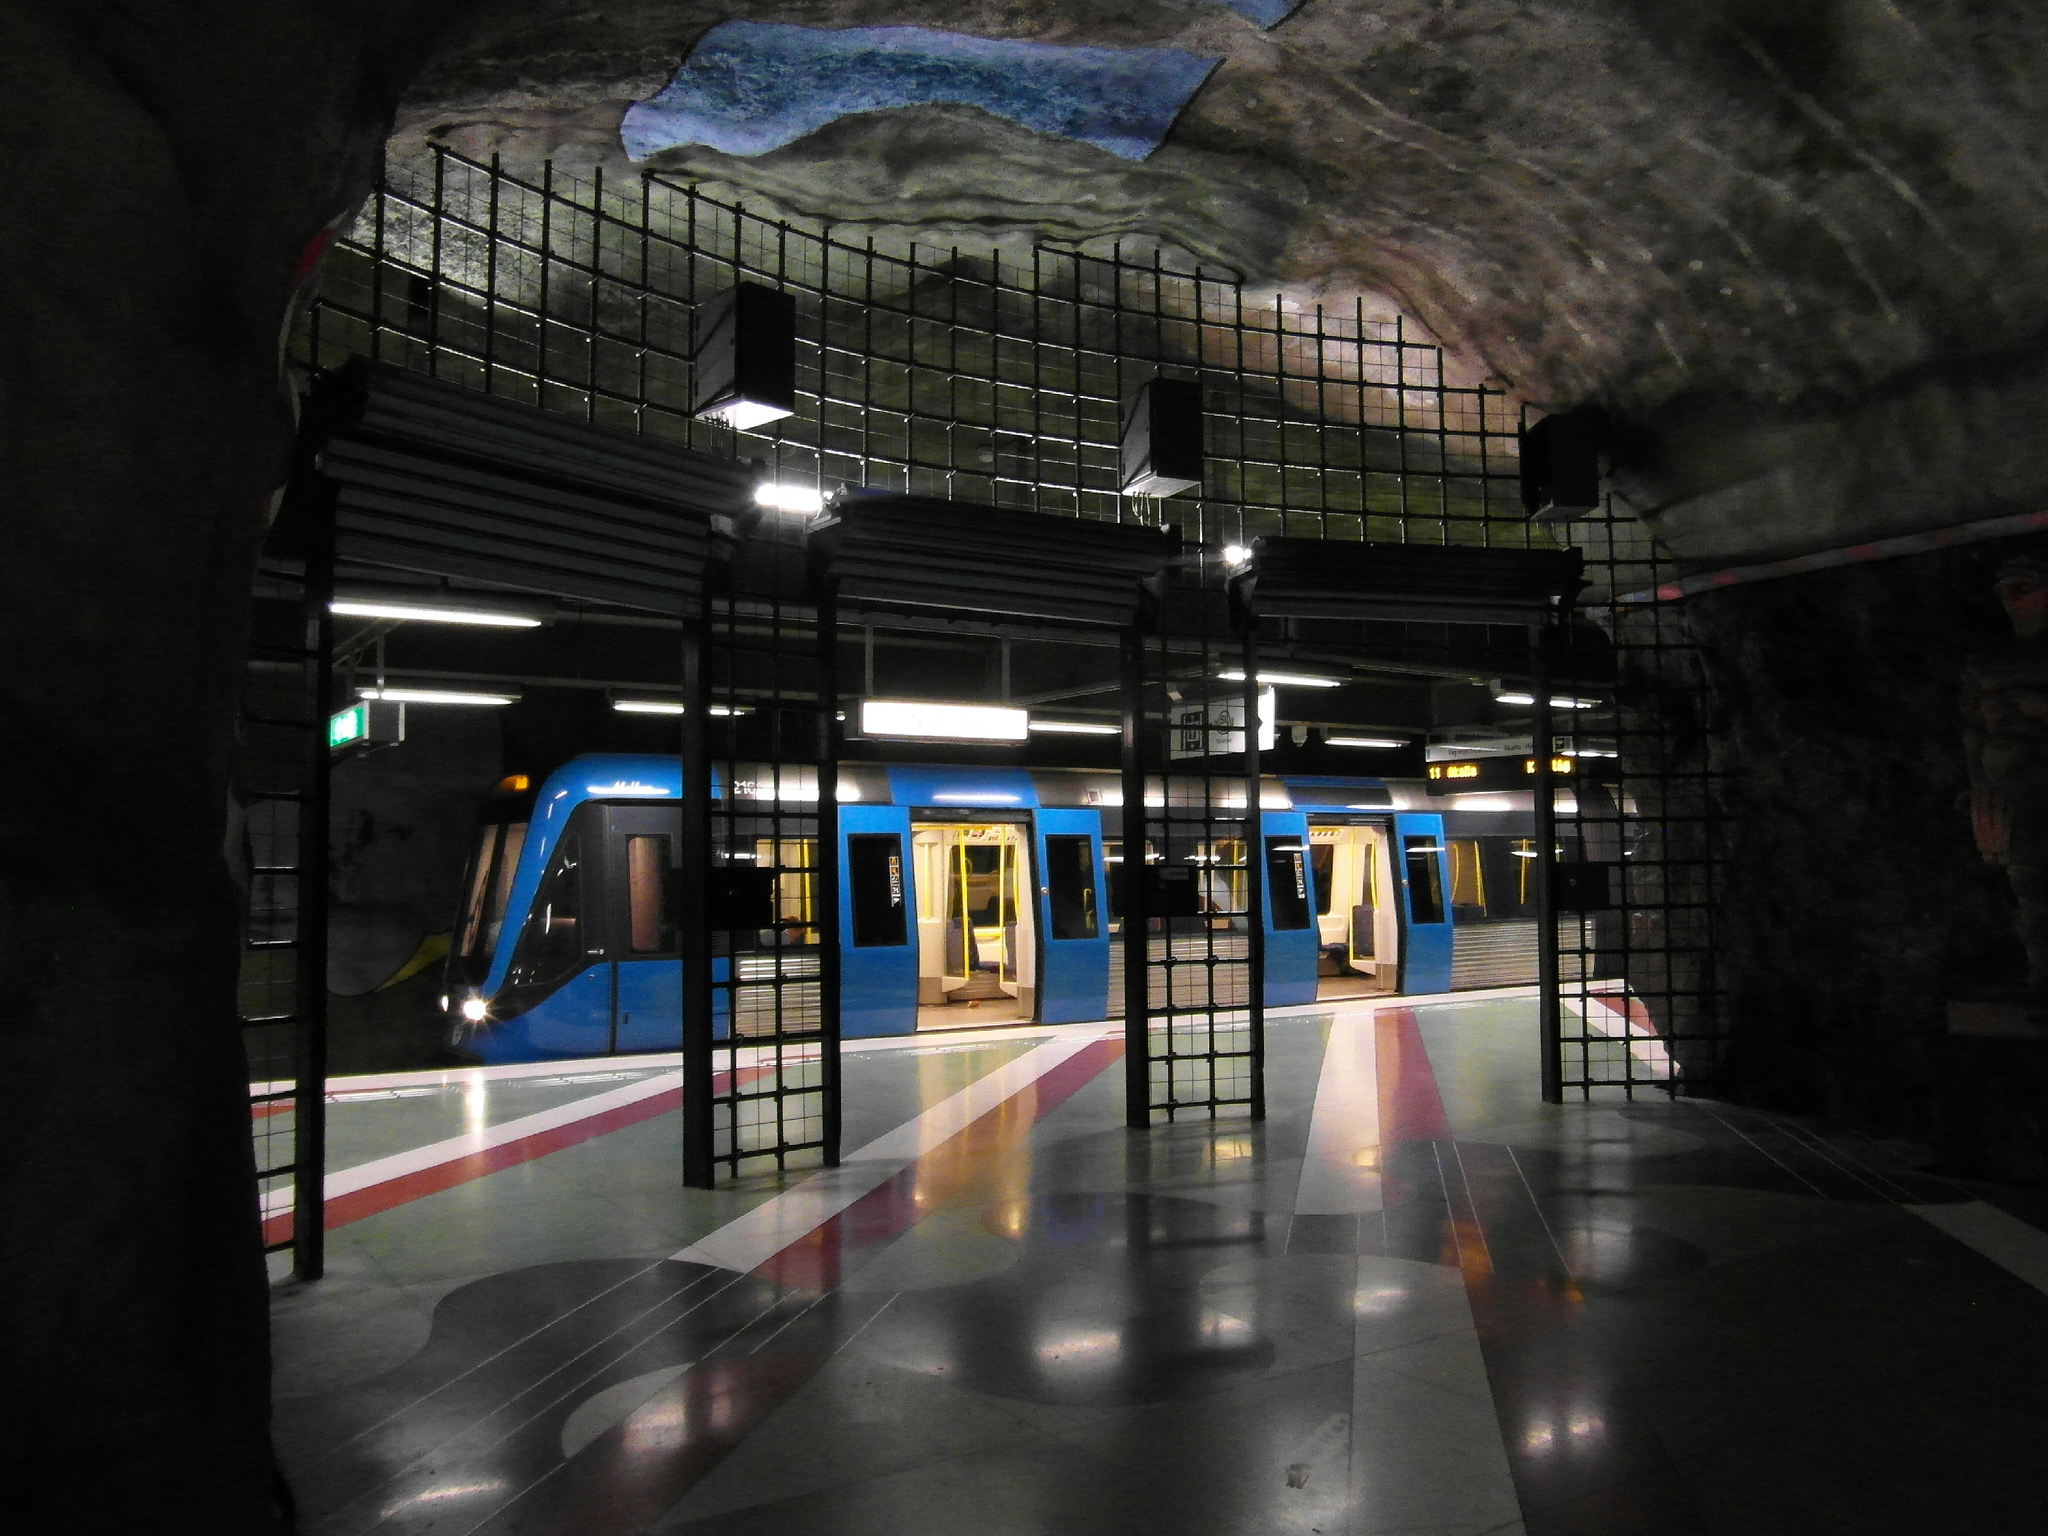 Cтанция метро Кунгстрадгодэн